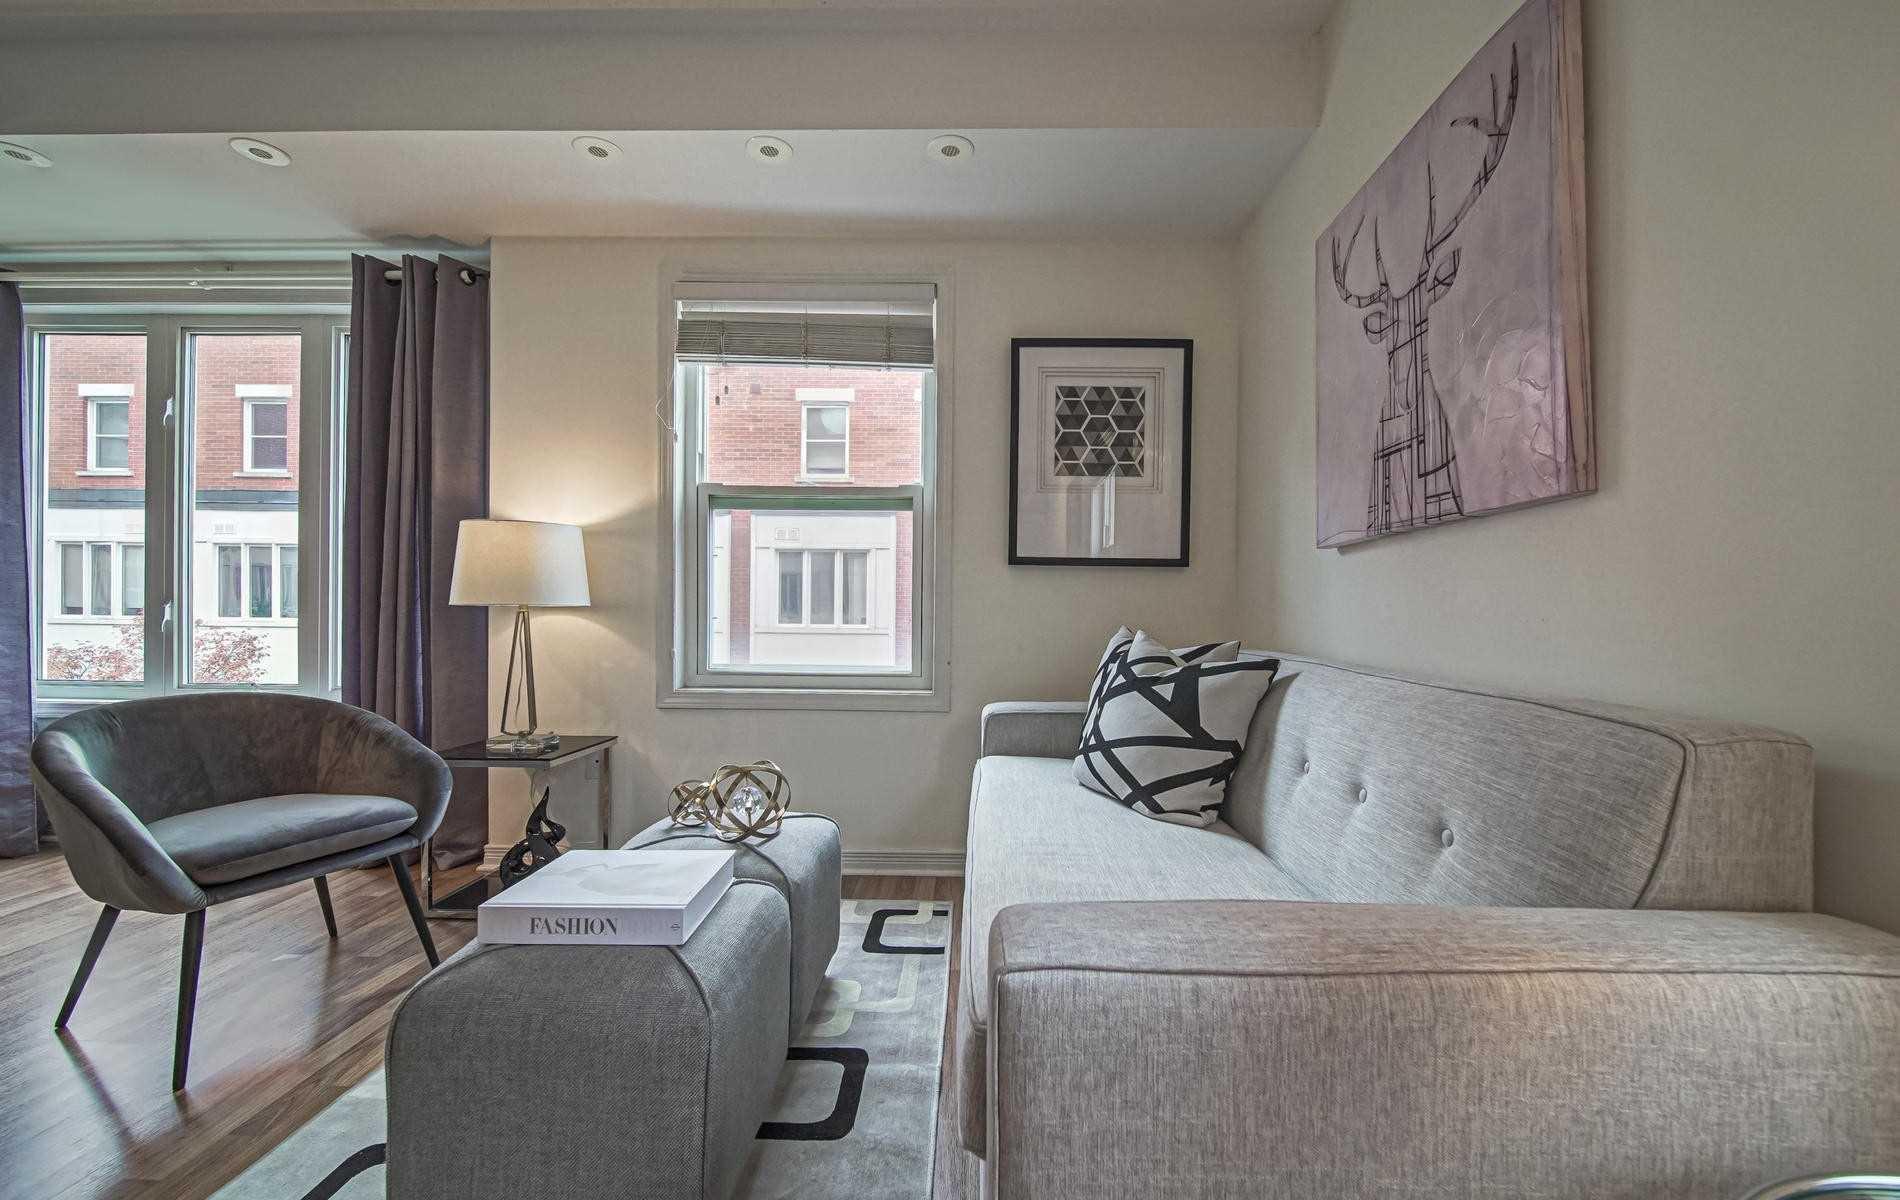 Photo 3: Photos: 3 78 Munro Street in Toronto: South Riverdale Condo for sale (Toronto E01)  : MLS®# E4615987